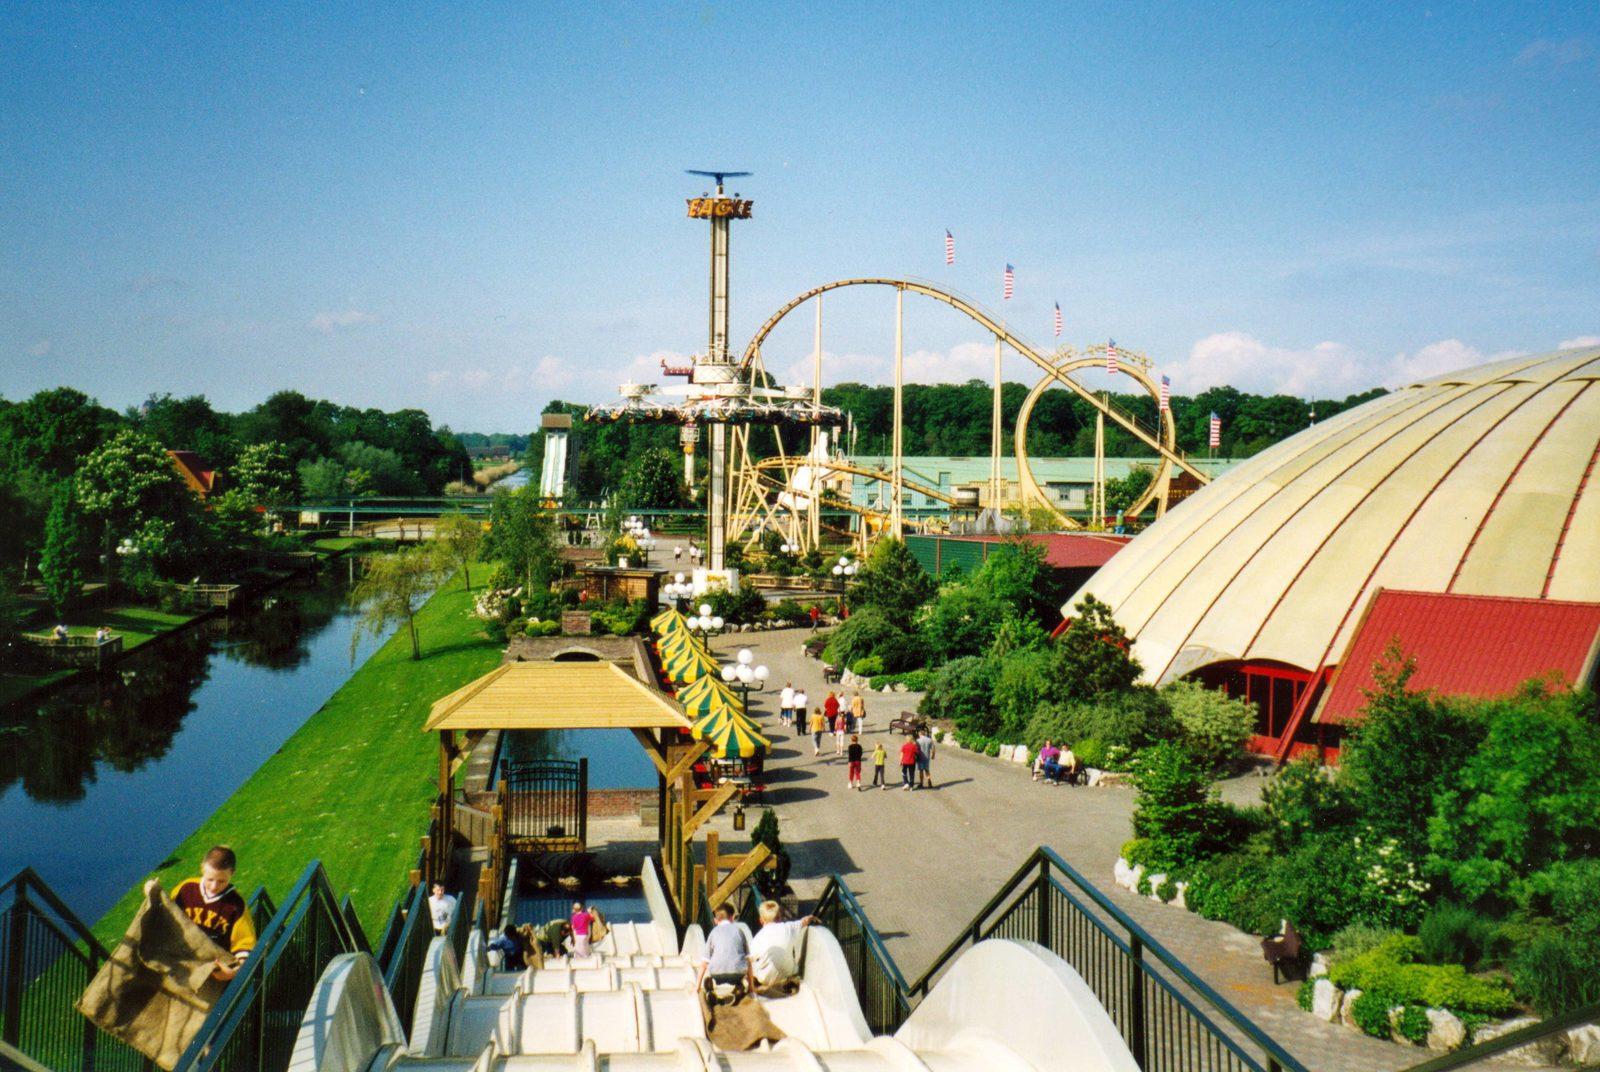 Amusement Park Slagharen